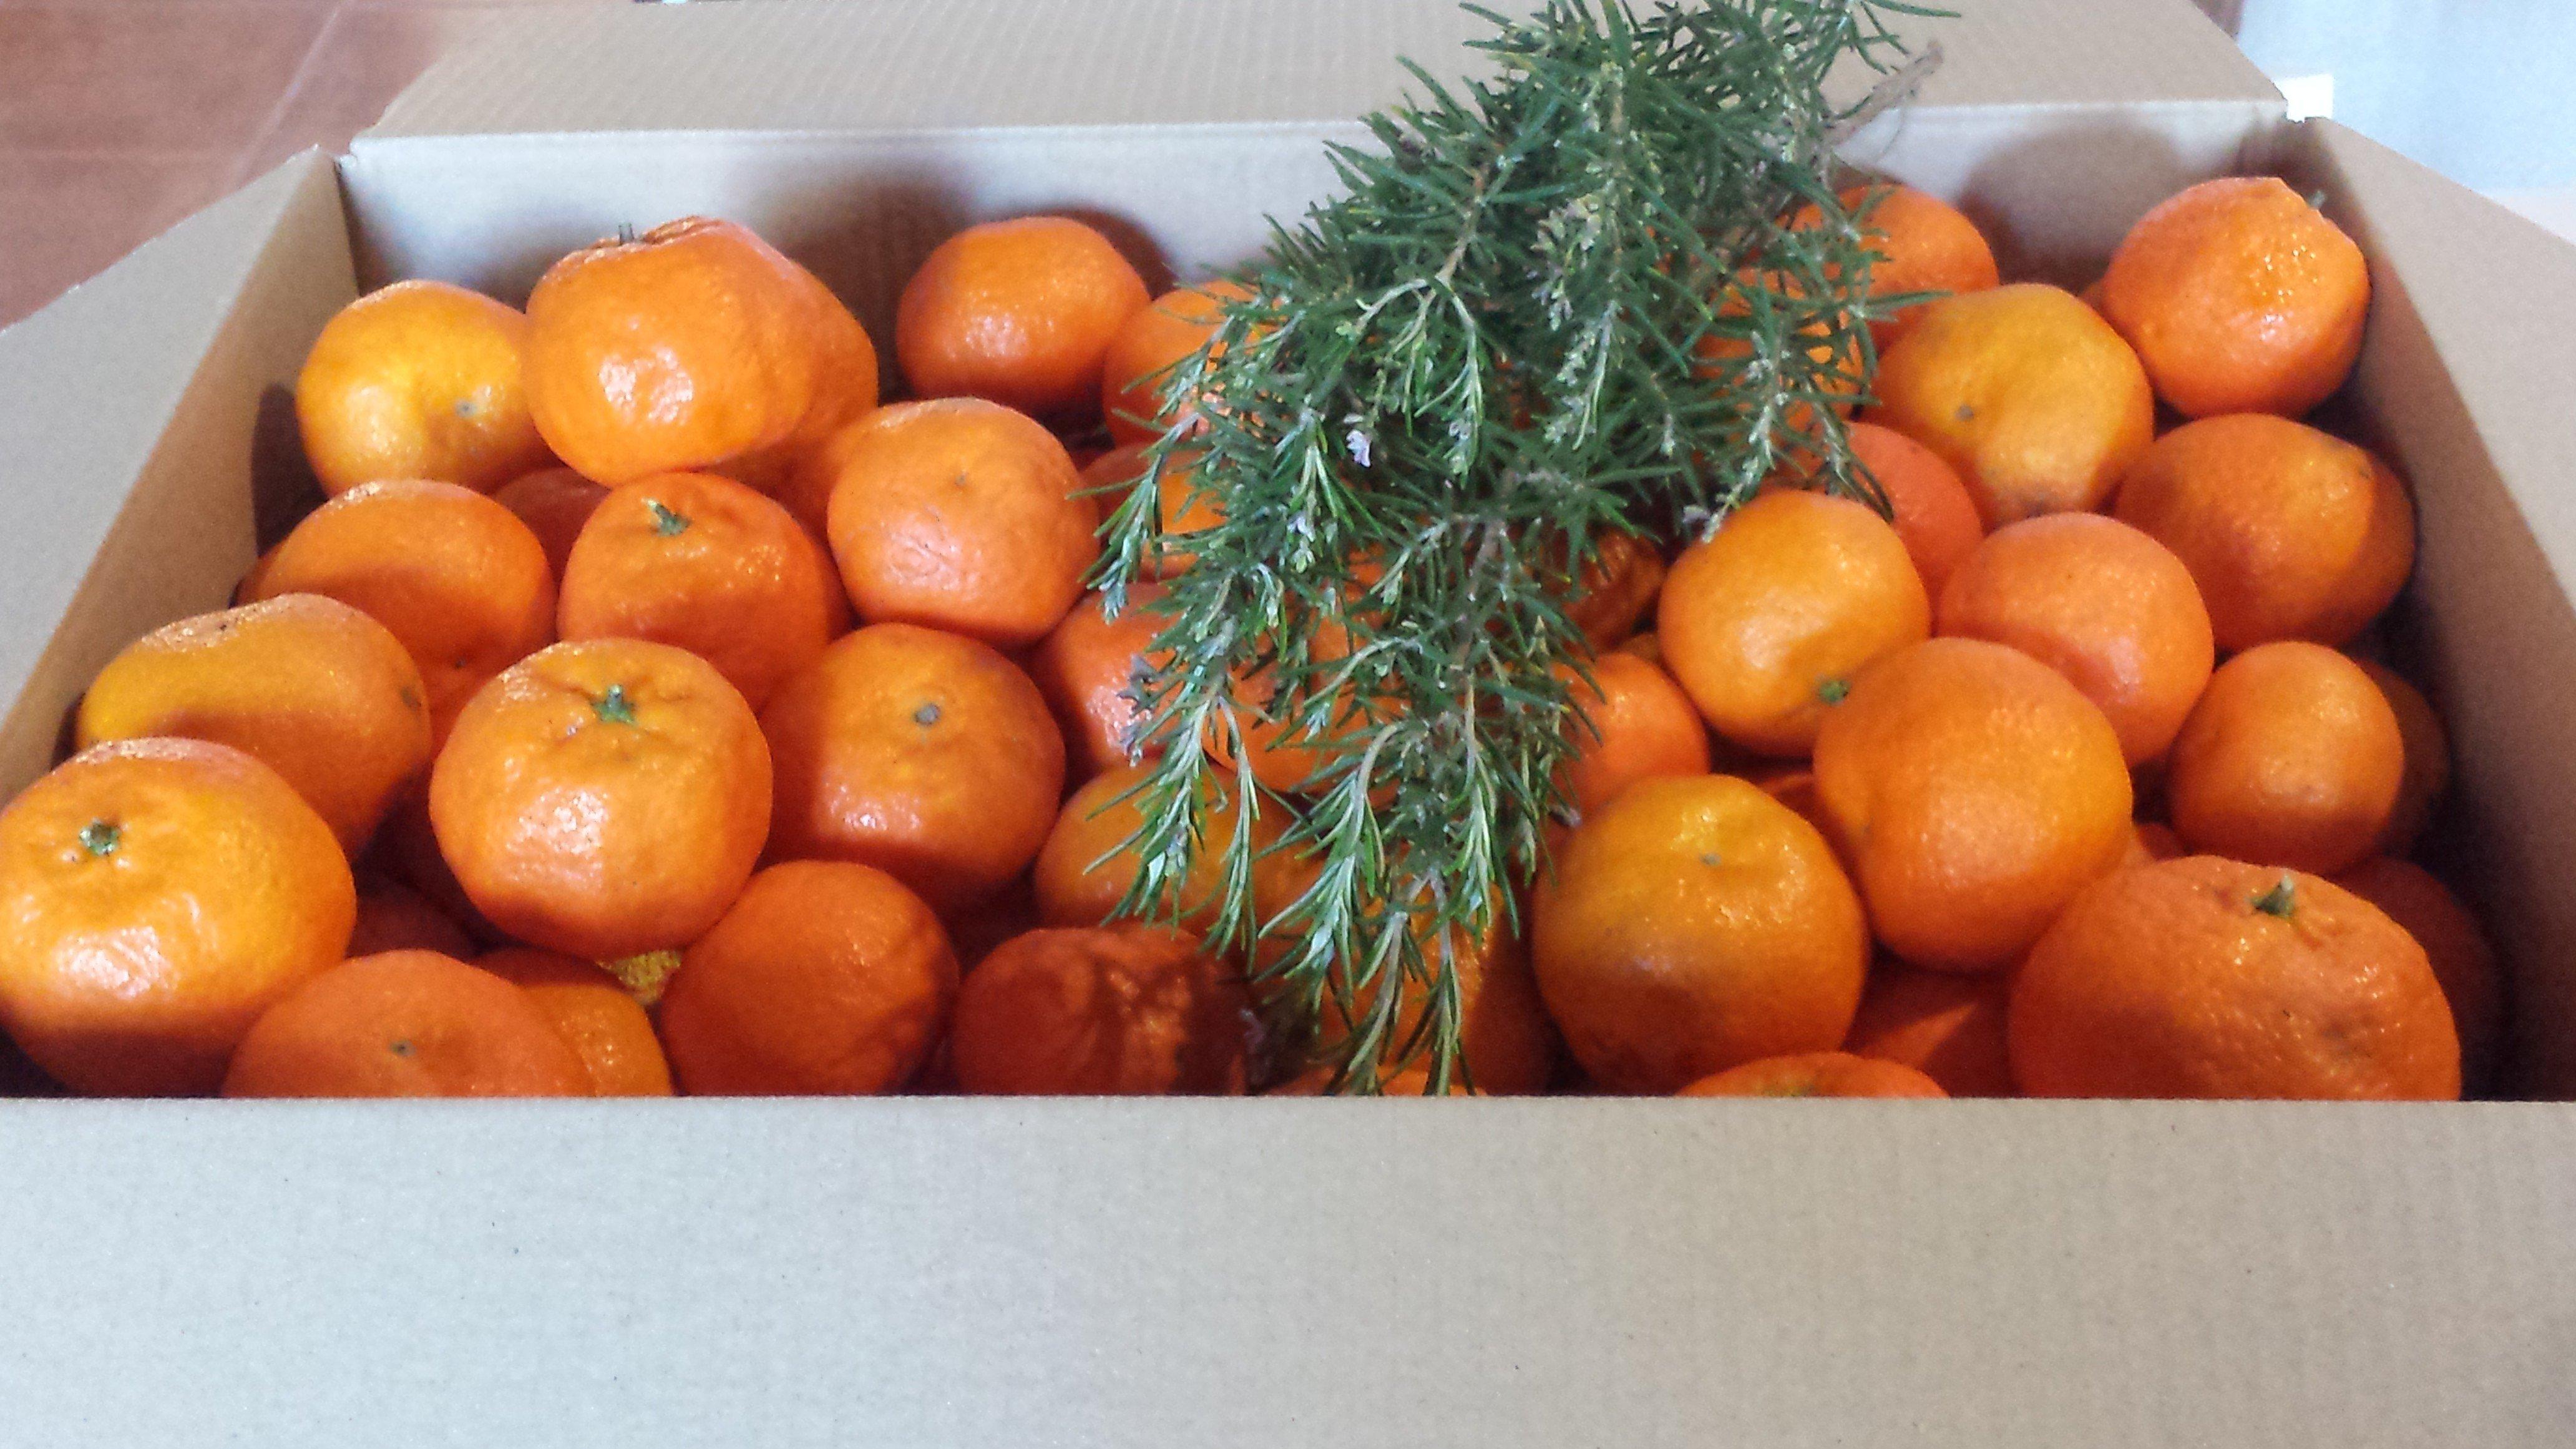 caja de clementinas - Cajas de clementinas Ibiza